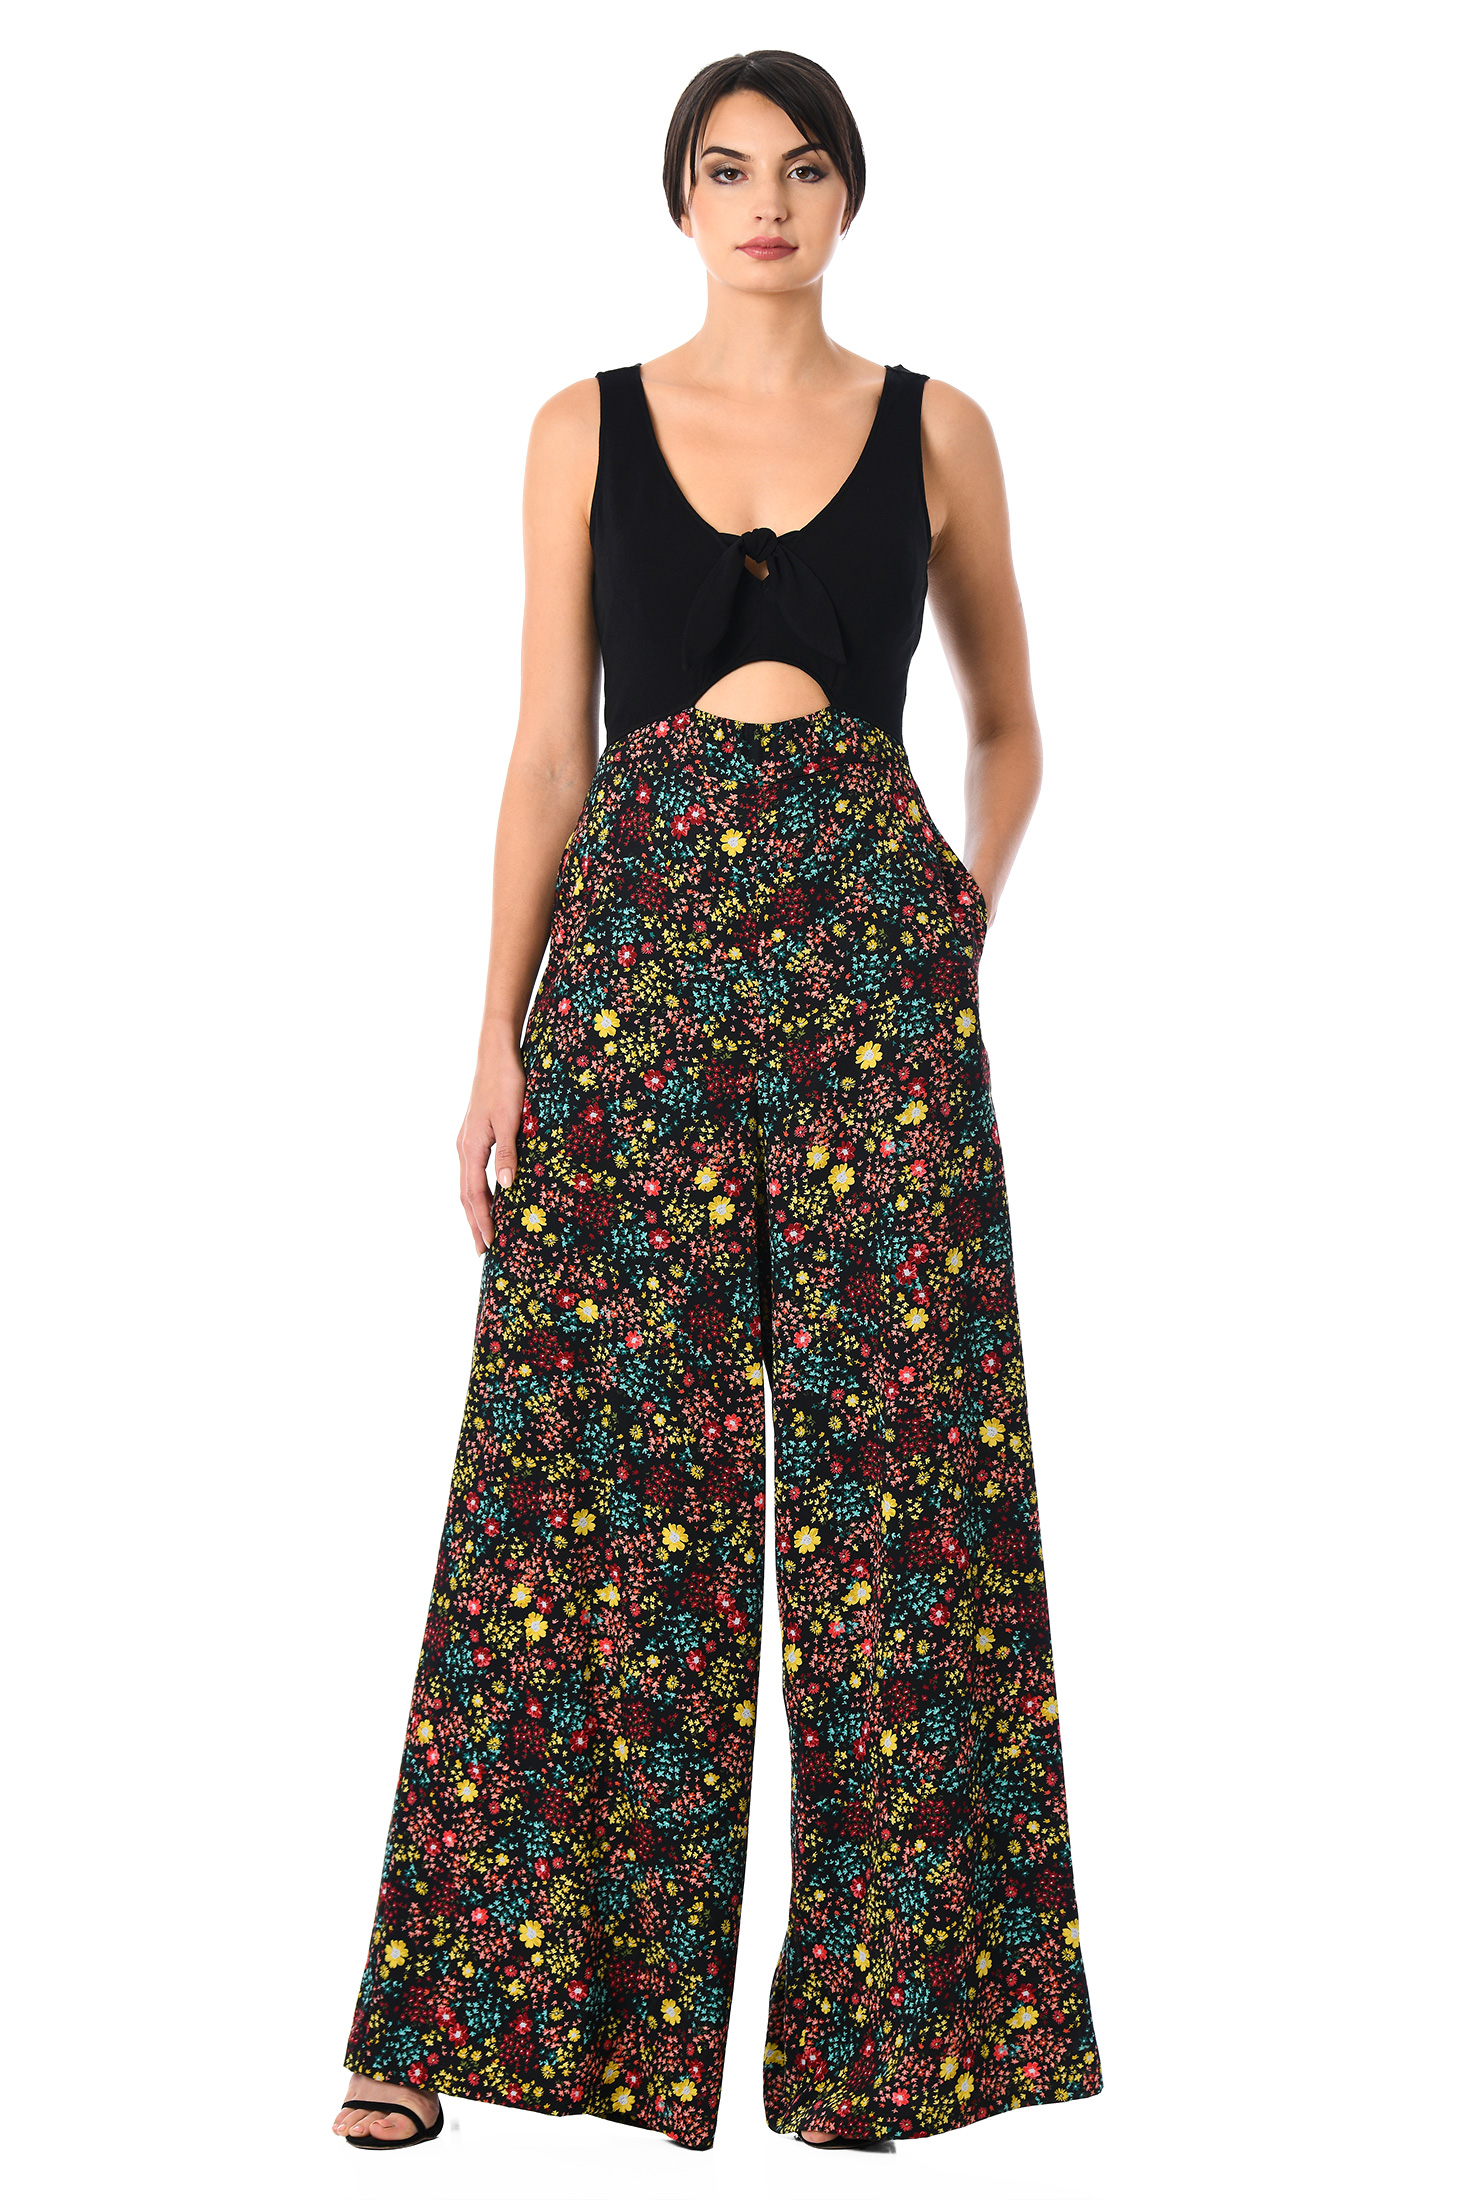 22362249a3e Women s Fashion Clothing 0-36W and Custom